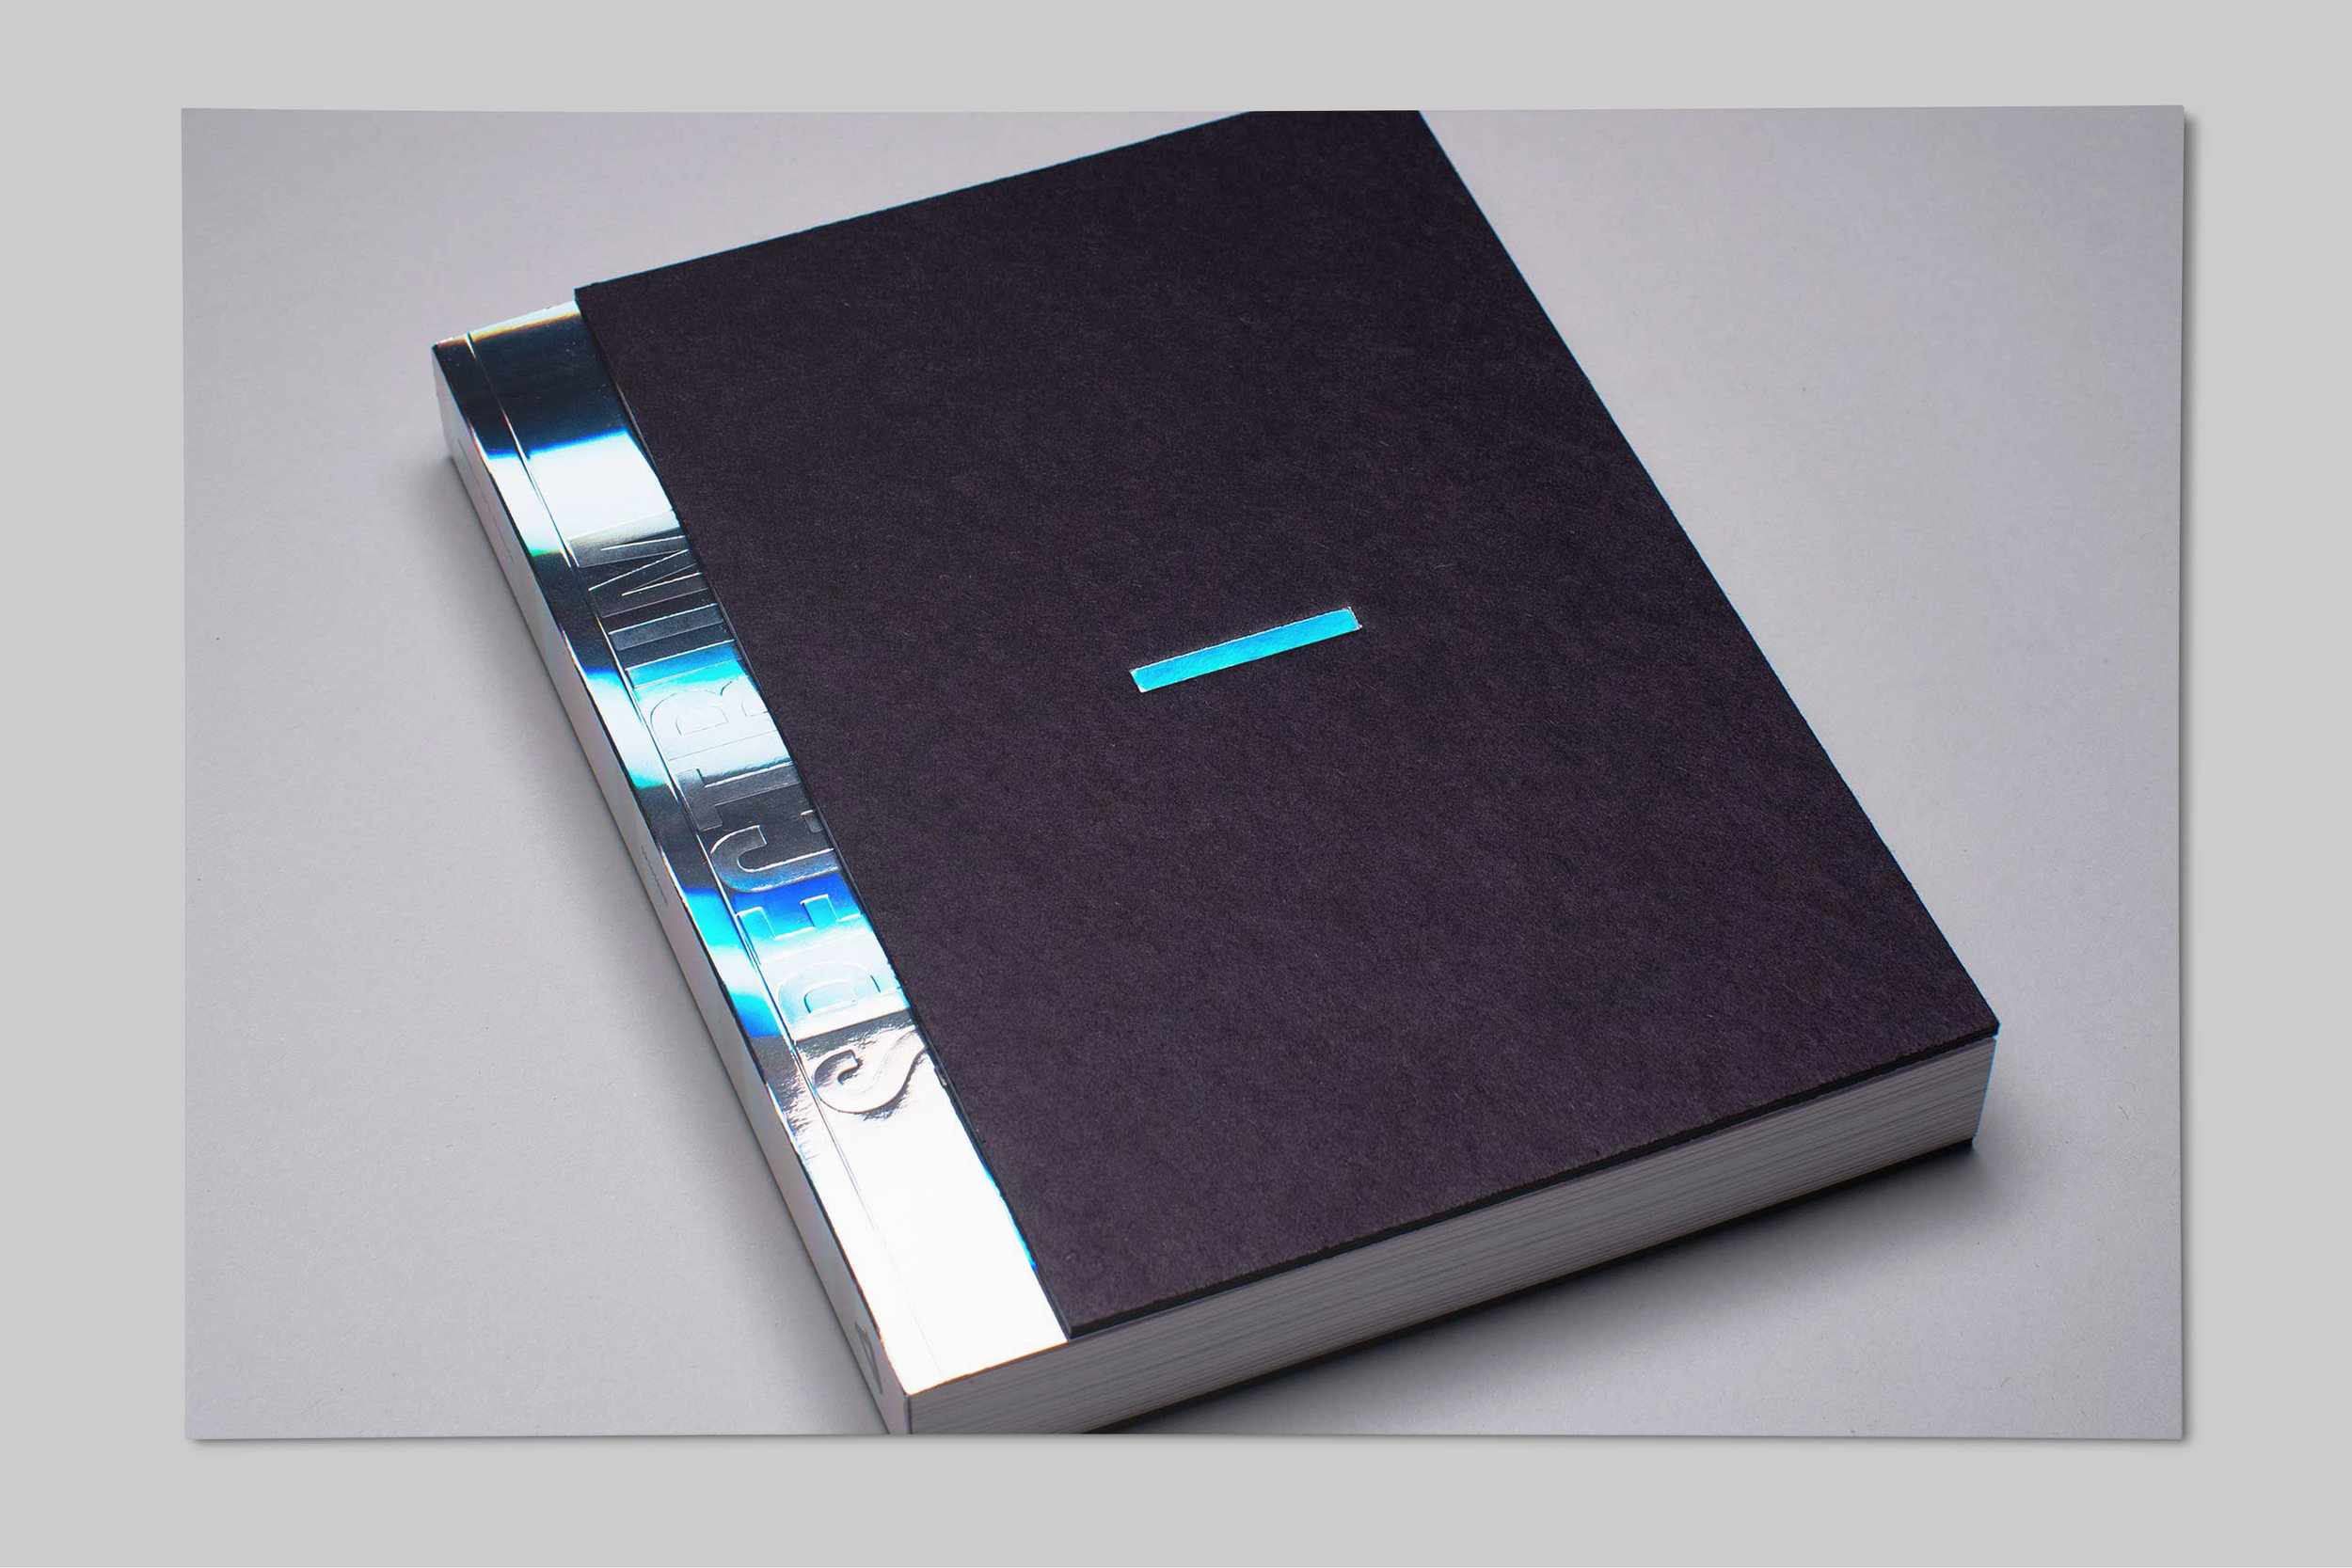 AppDirect Yearbook: Spectrum   Designed with Ben Domanico, Alex Capasso, Carolyn Cuykendall, and Joe Mayo